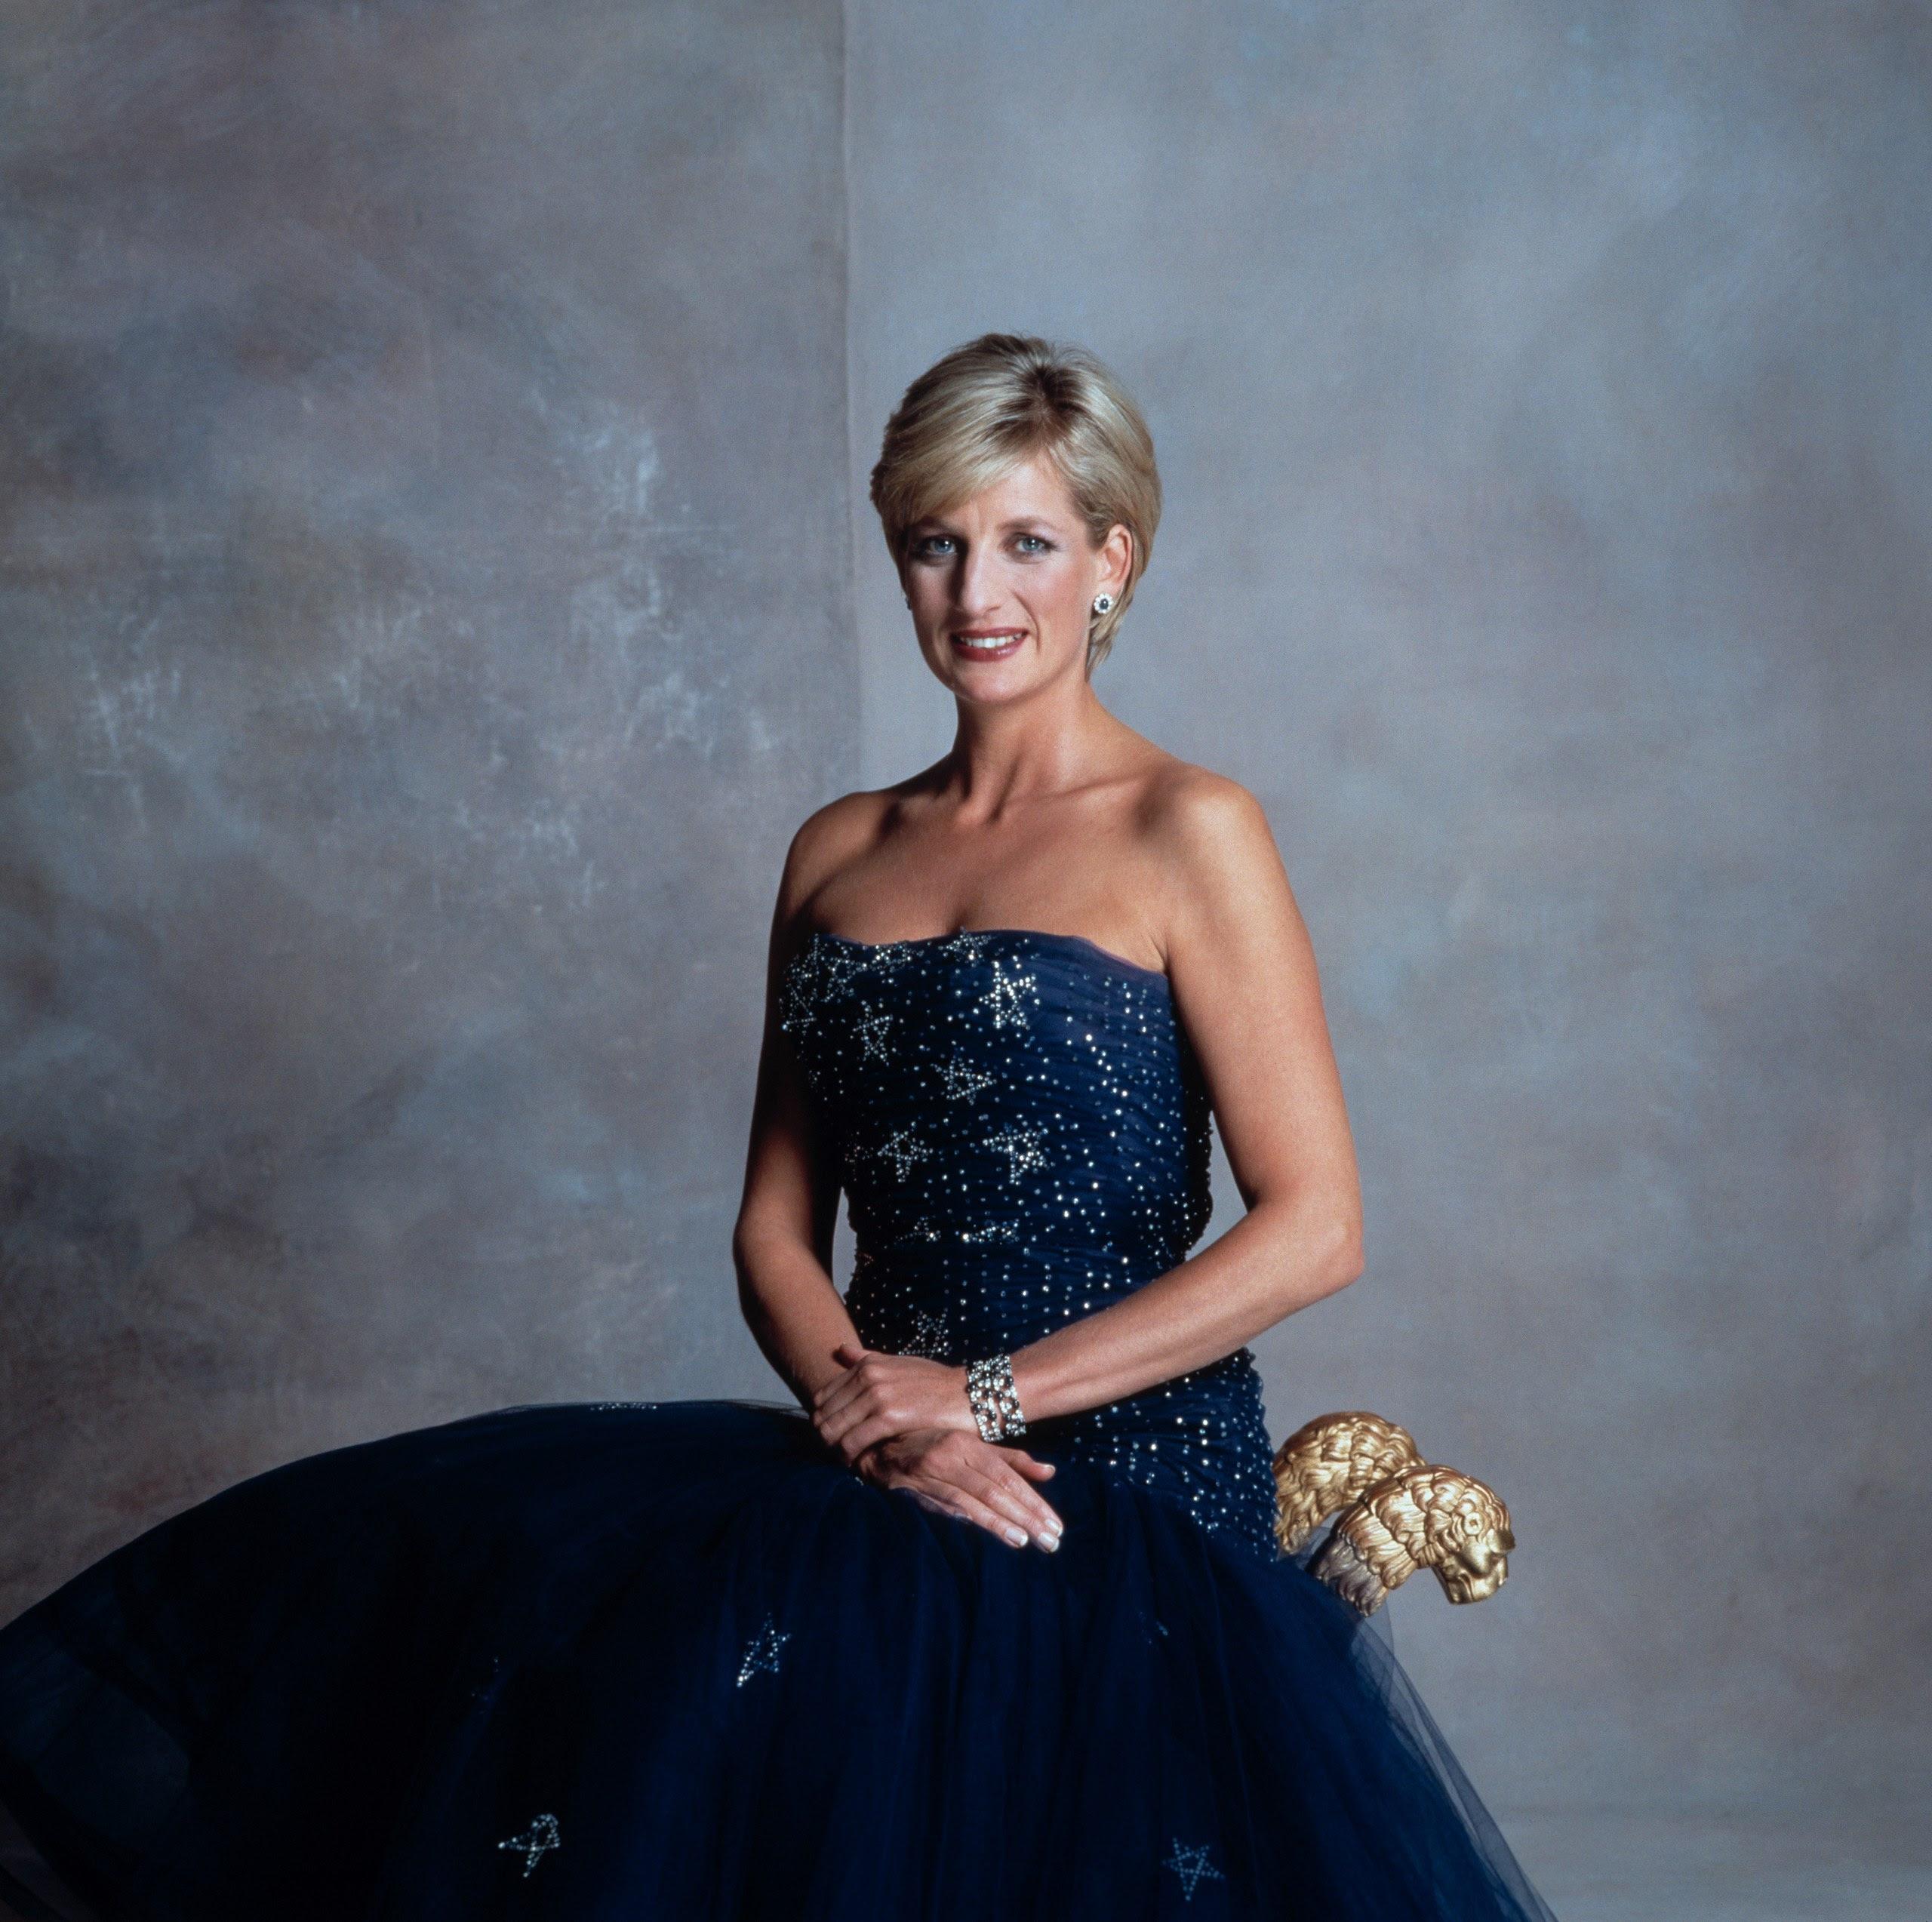 Diana Princess Diana Photo 21733027 Fanpop Images, Photos, Reviews